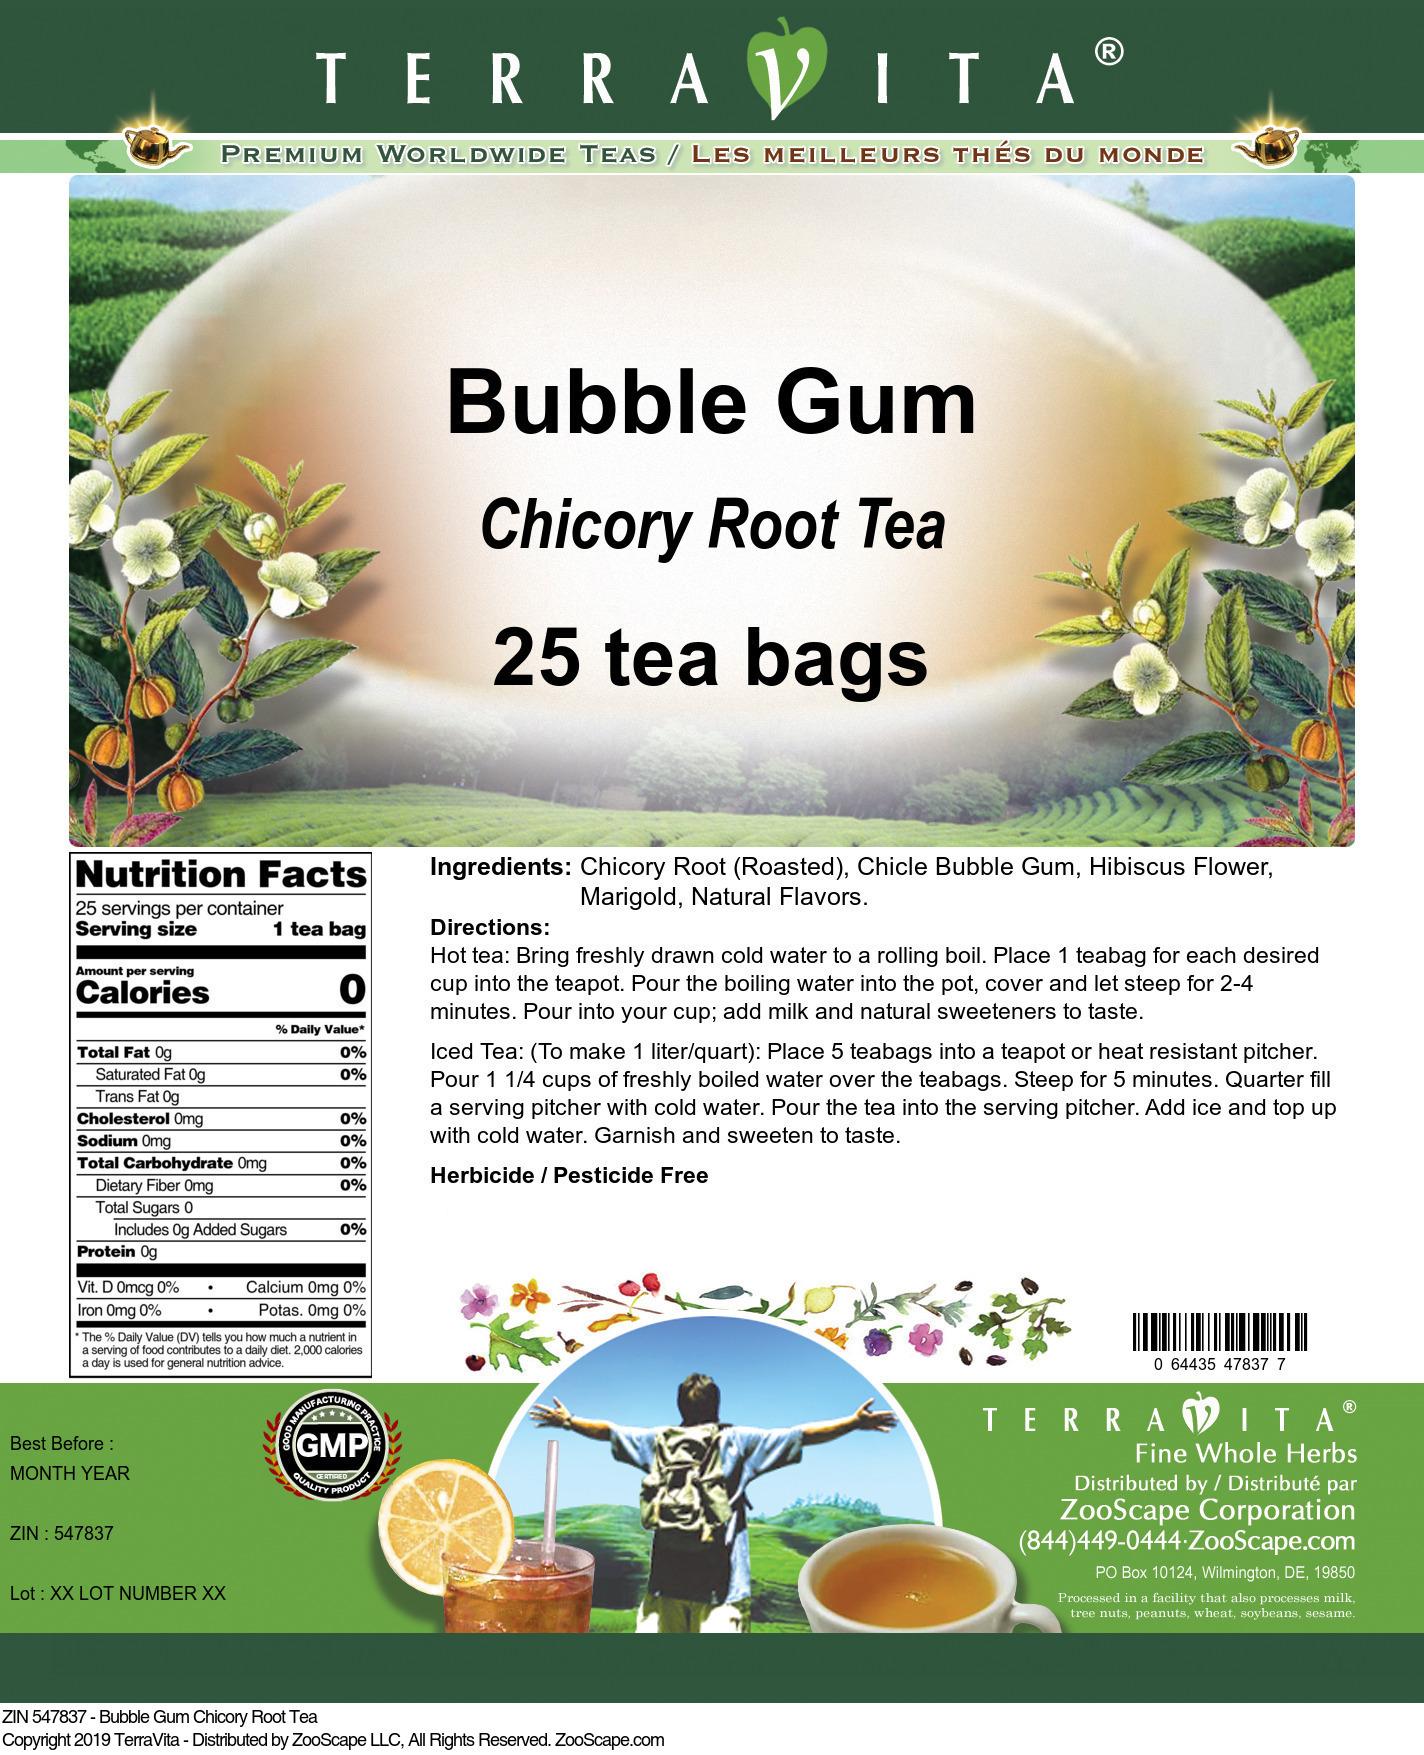 Bubble Gum Chicory Root Tea